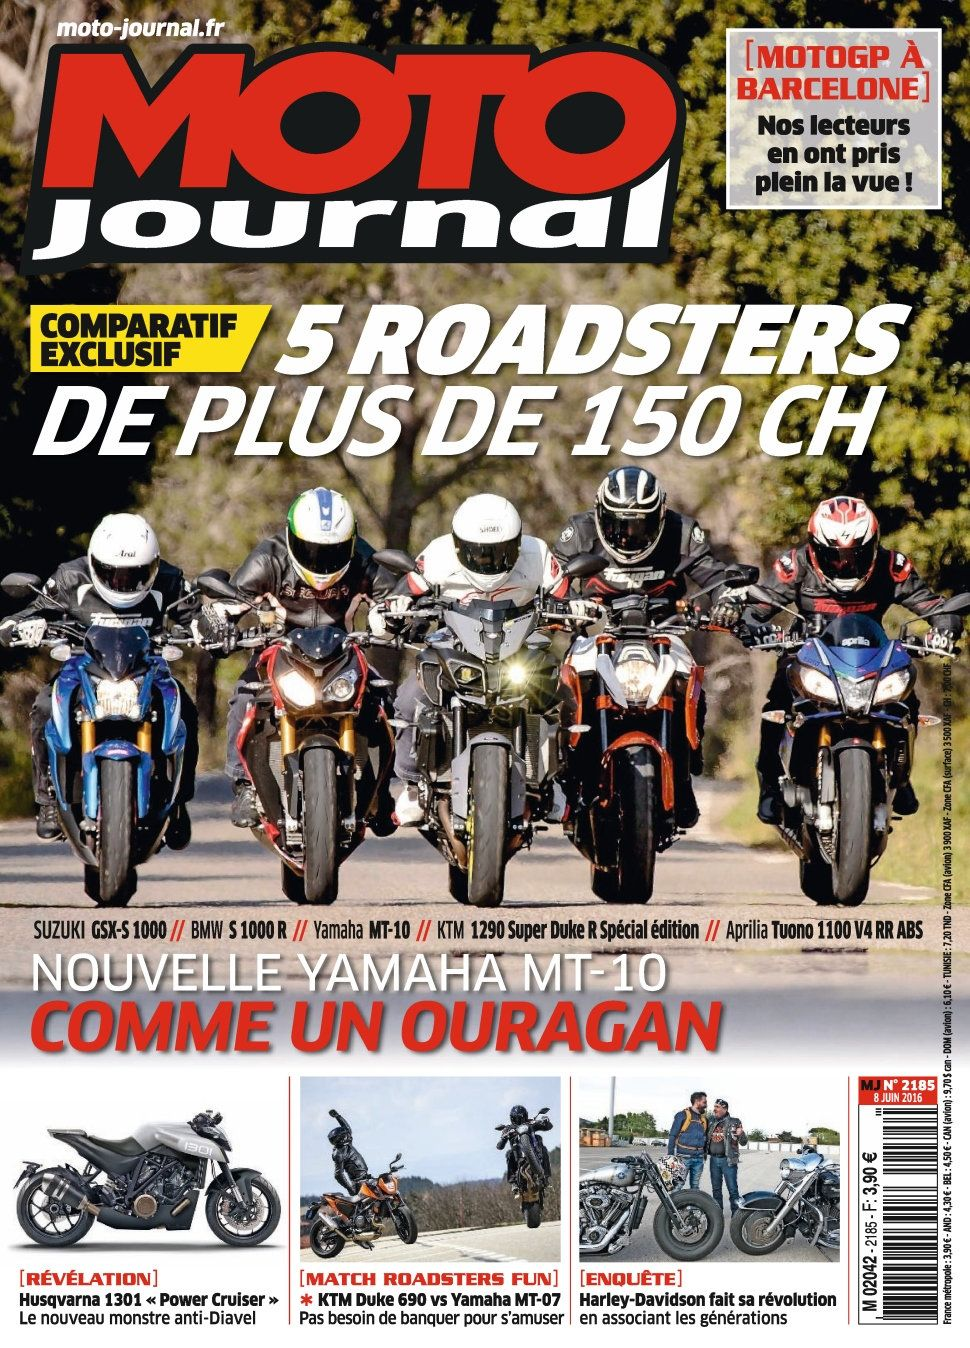 Moto Journal 2185 - 08 Juin 2016